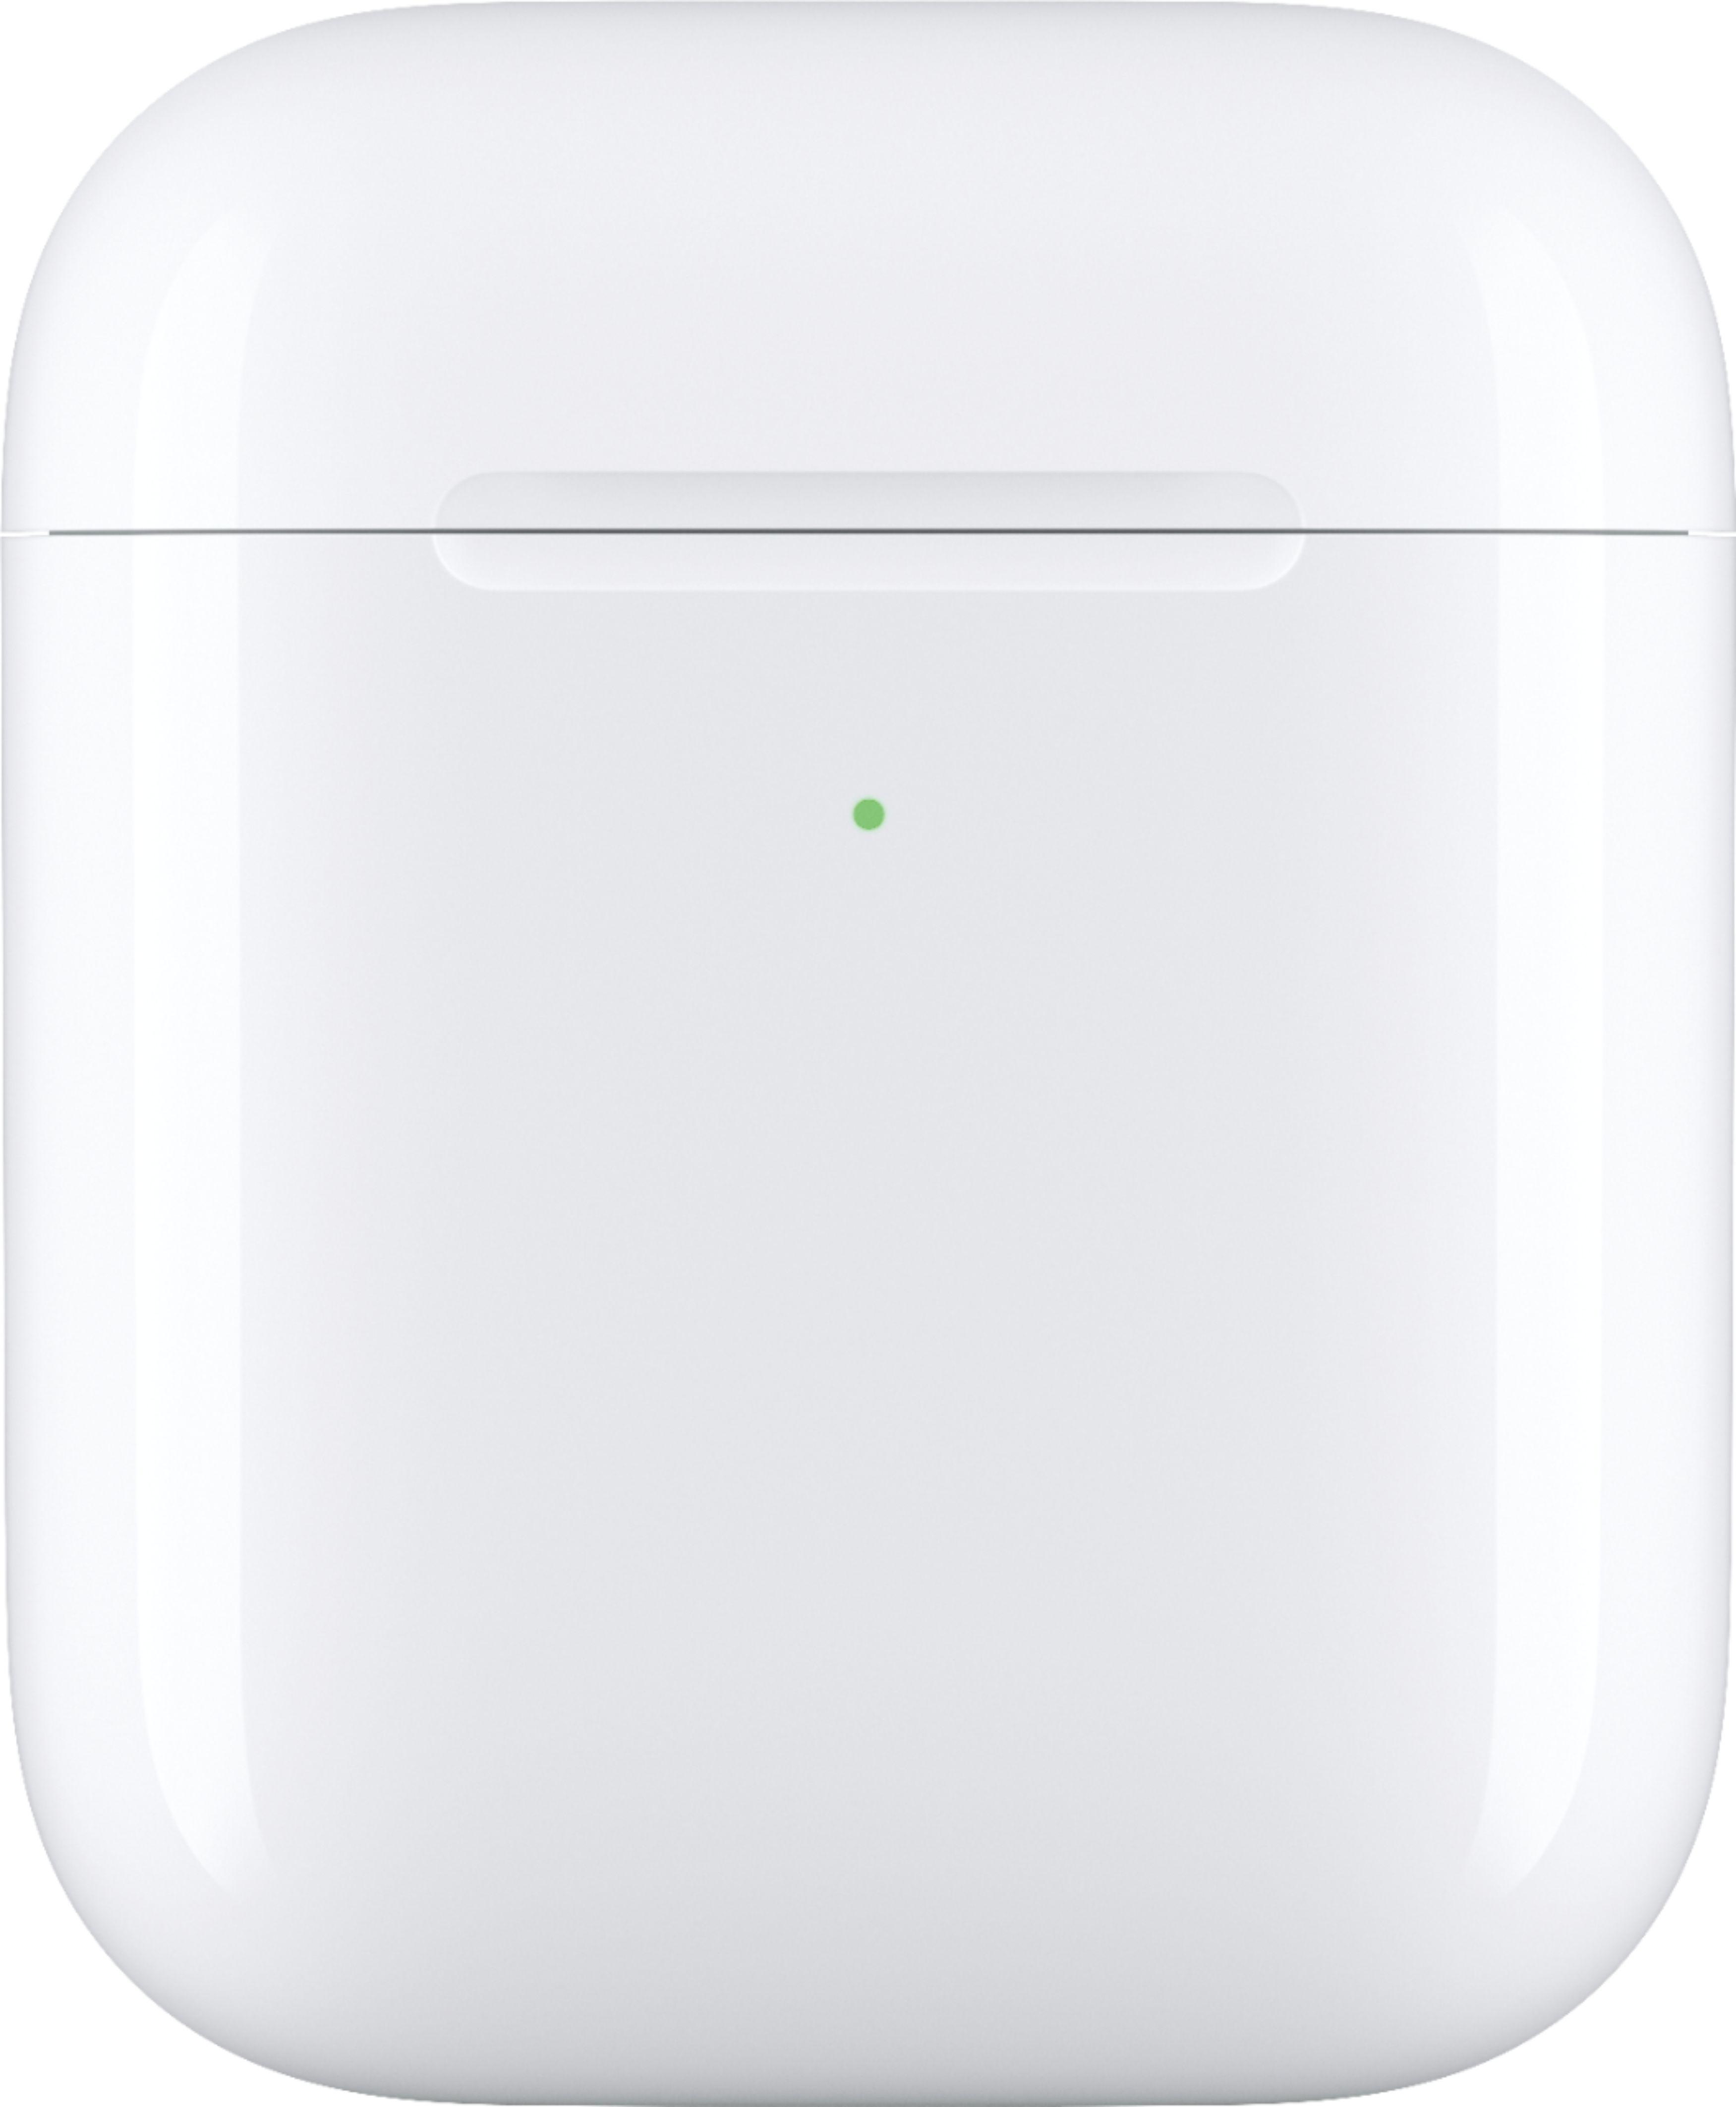 apple-airpods-wireless-charging-case-white-2.jpg